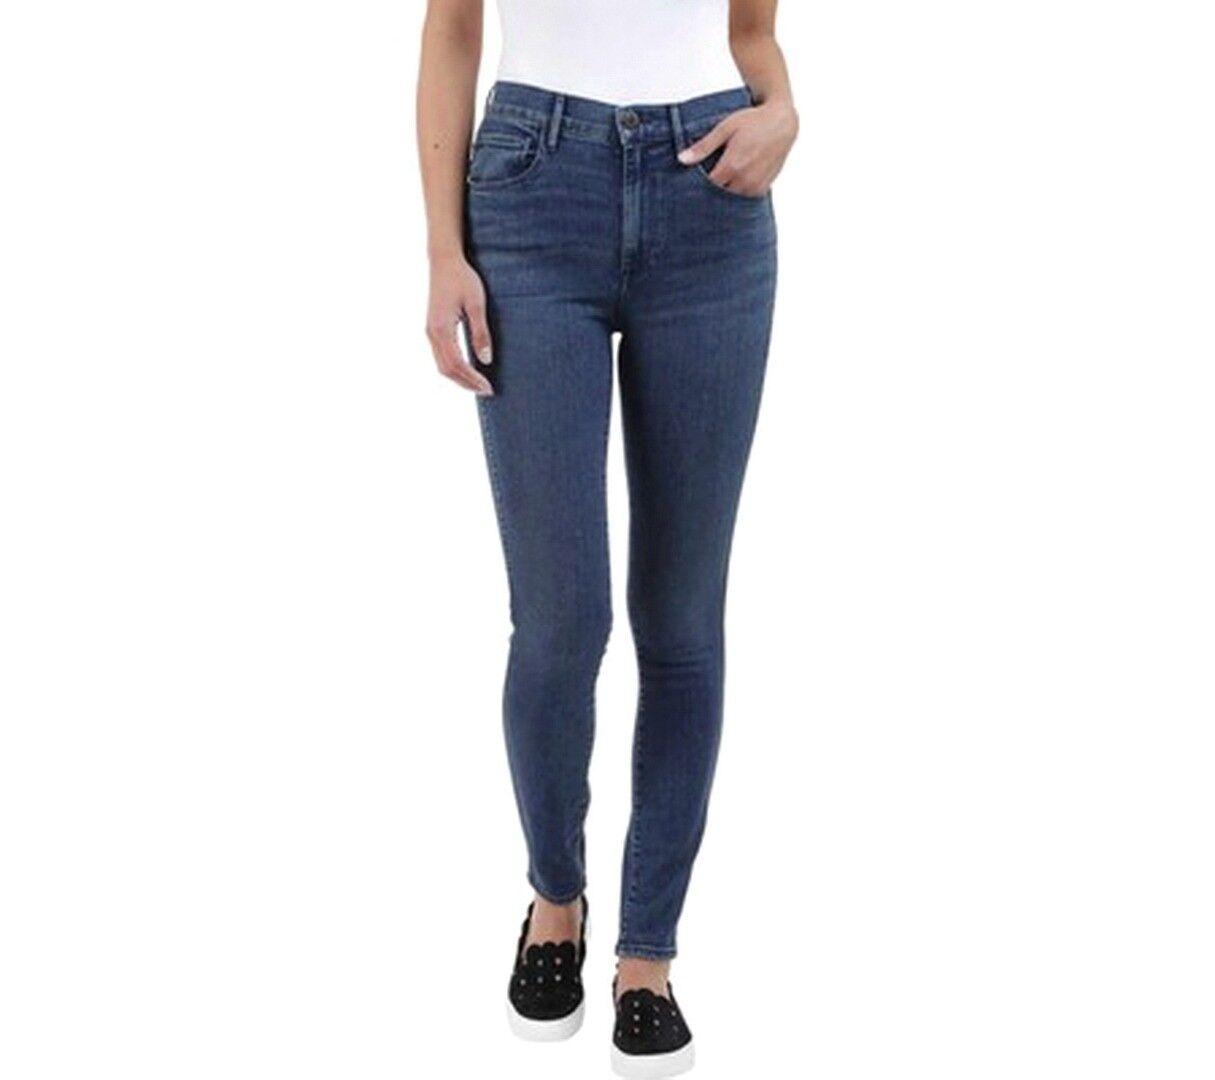 3X1 Shelter High Rise Skinny Jeans Iris Sz 25 Sz 30   153F